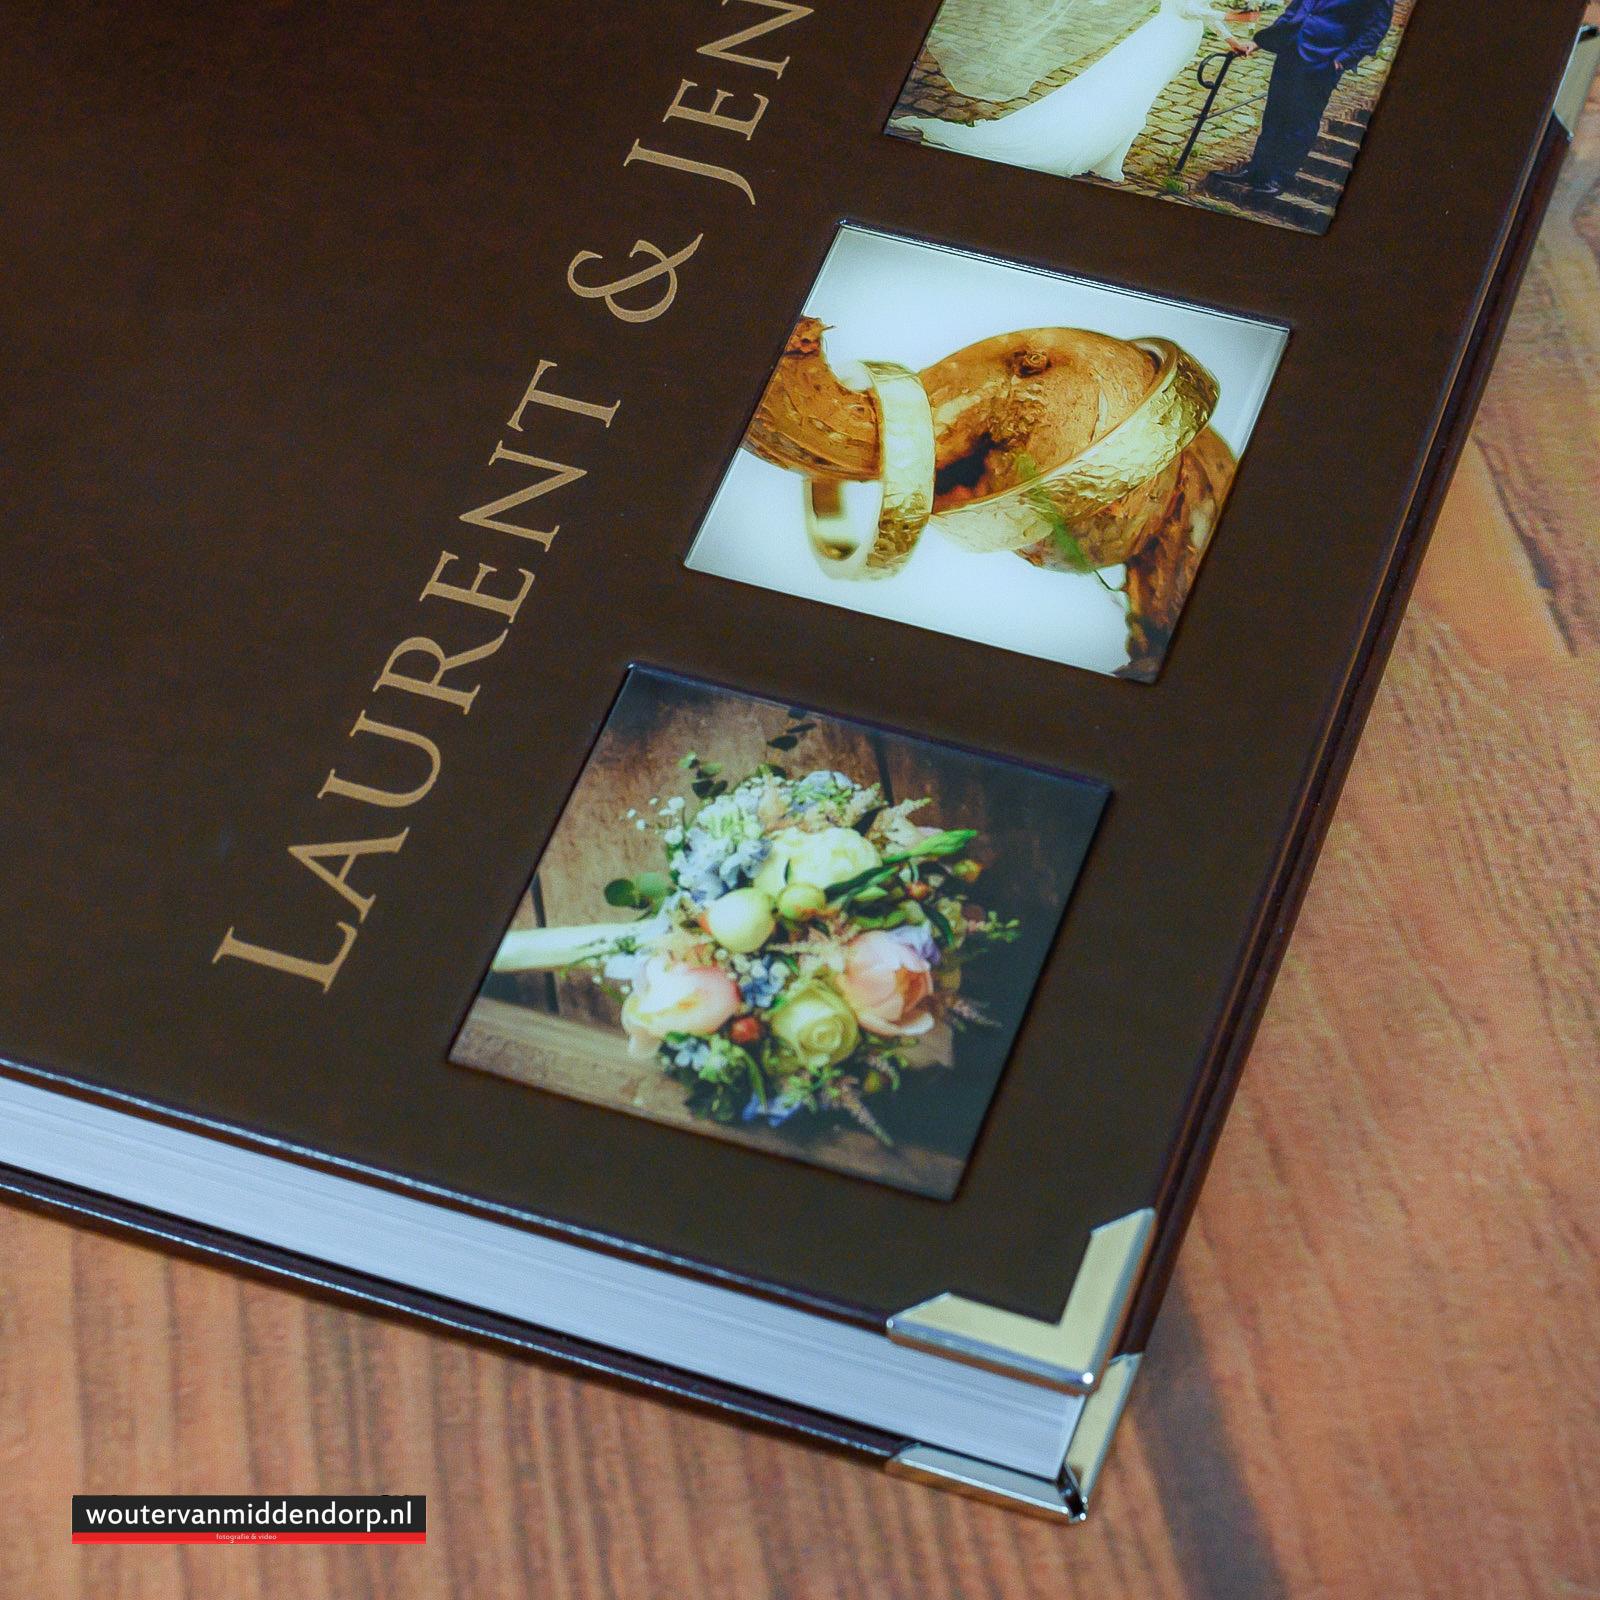 trouwalbum, bruidsreportage, trouwfotograaf, groepsfoto, fotograaf, Wouter van Middendorp, Veluwe, Uddel, Lunteren, (2)